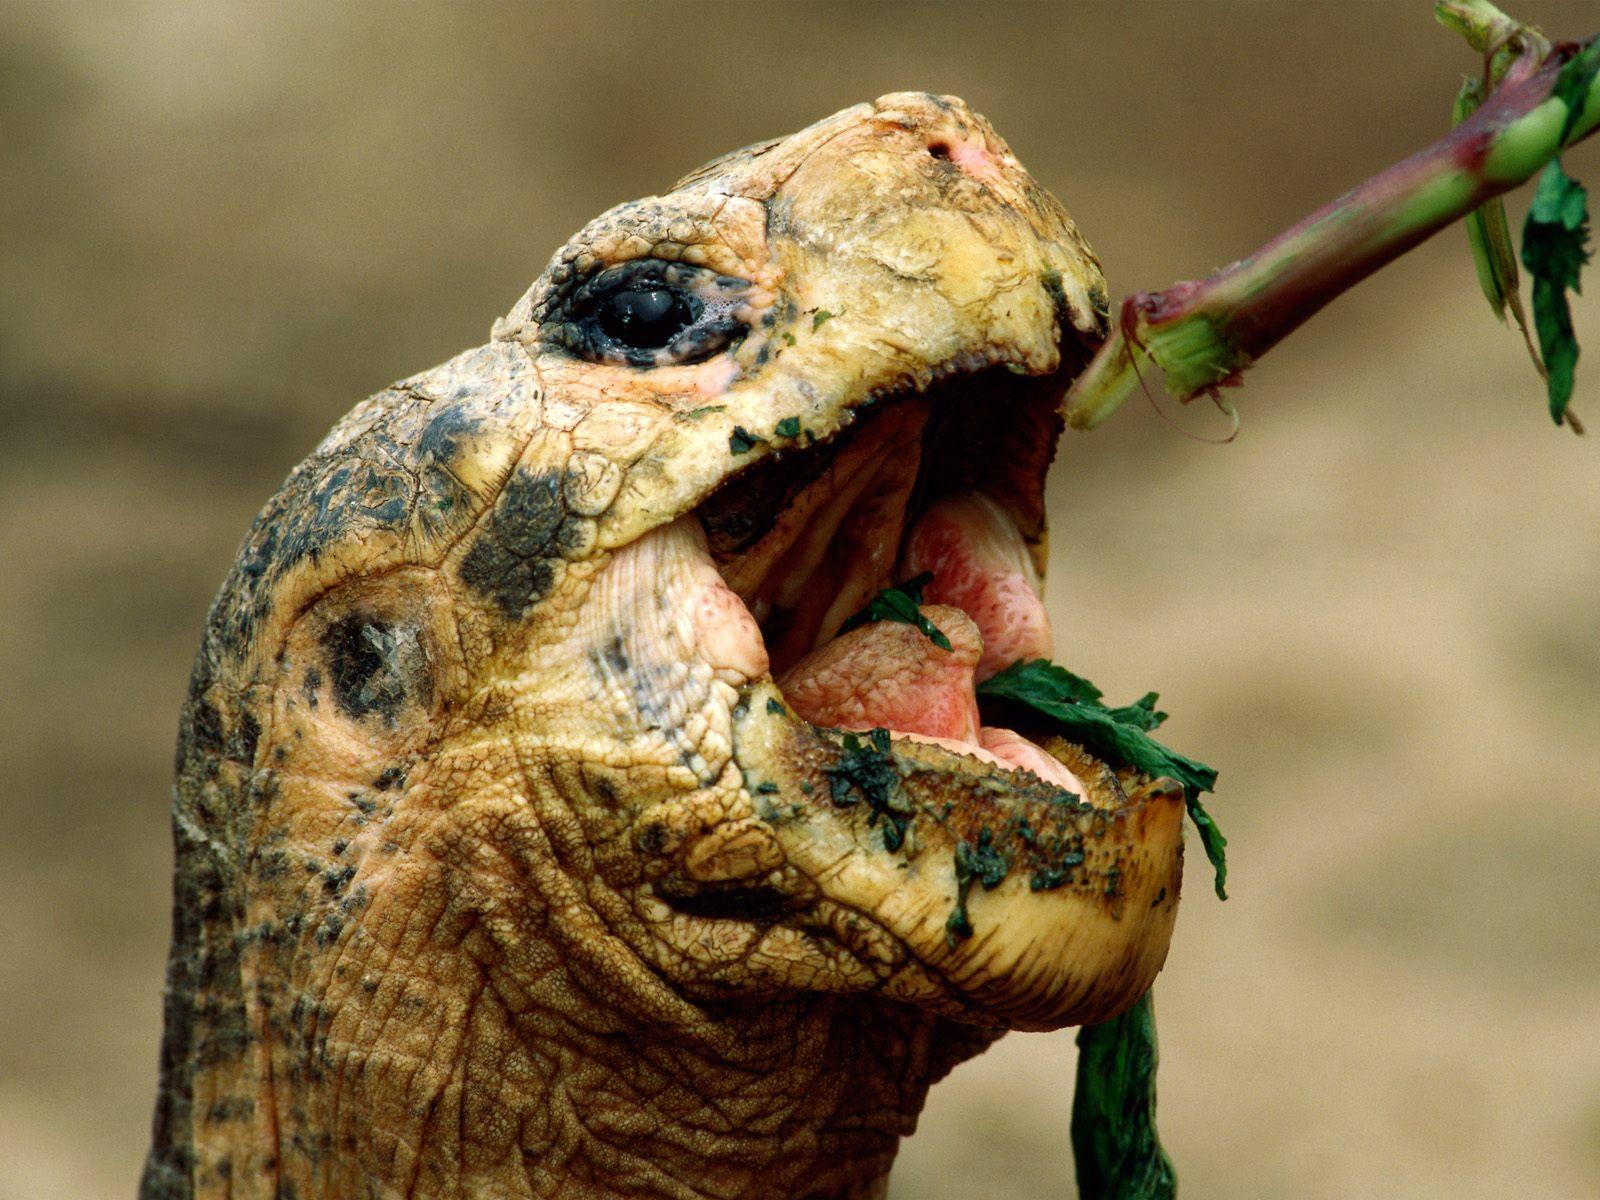 http://4.bp.blogspot.com/-xl-nbv-KKB8/UDmbe1KDE2I/AAAAAAAABQM/xWvgBY9MuB8/s1600/Turtle+Snack.jpg